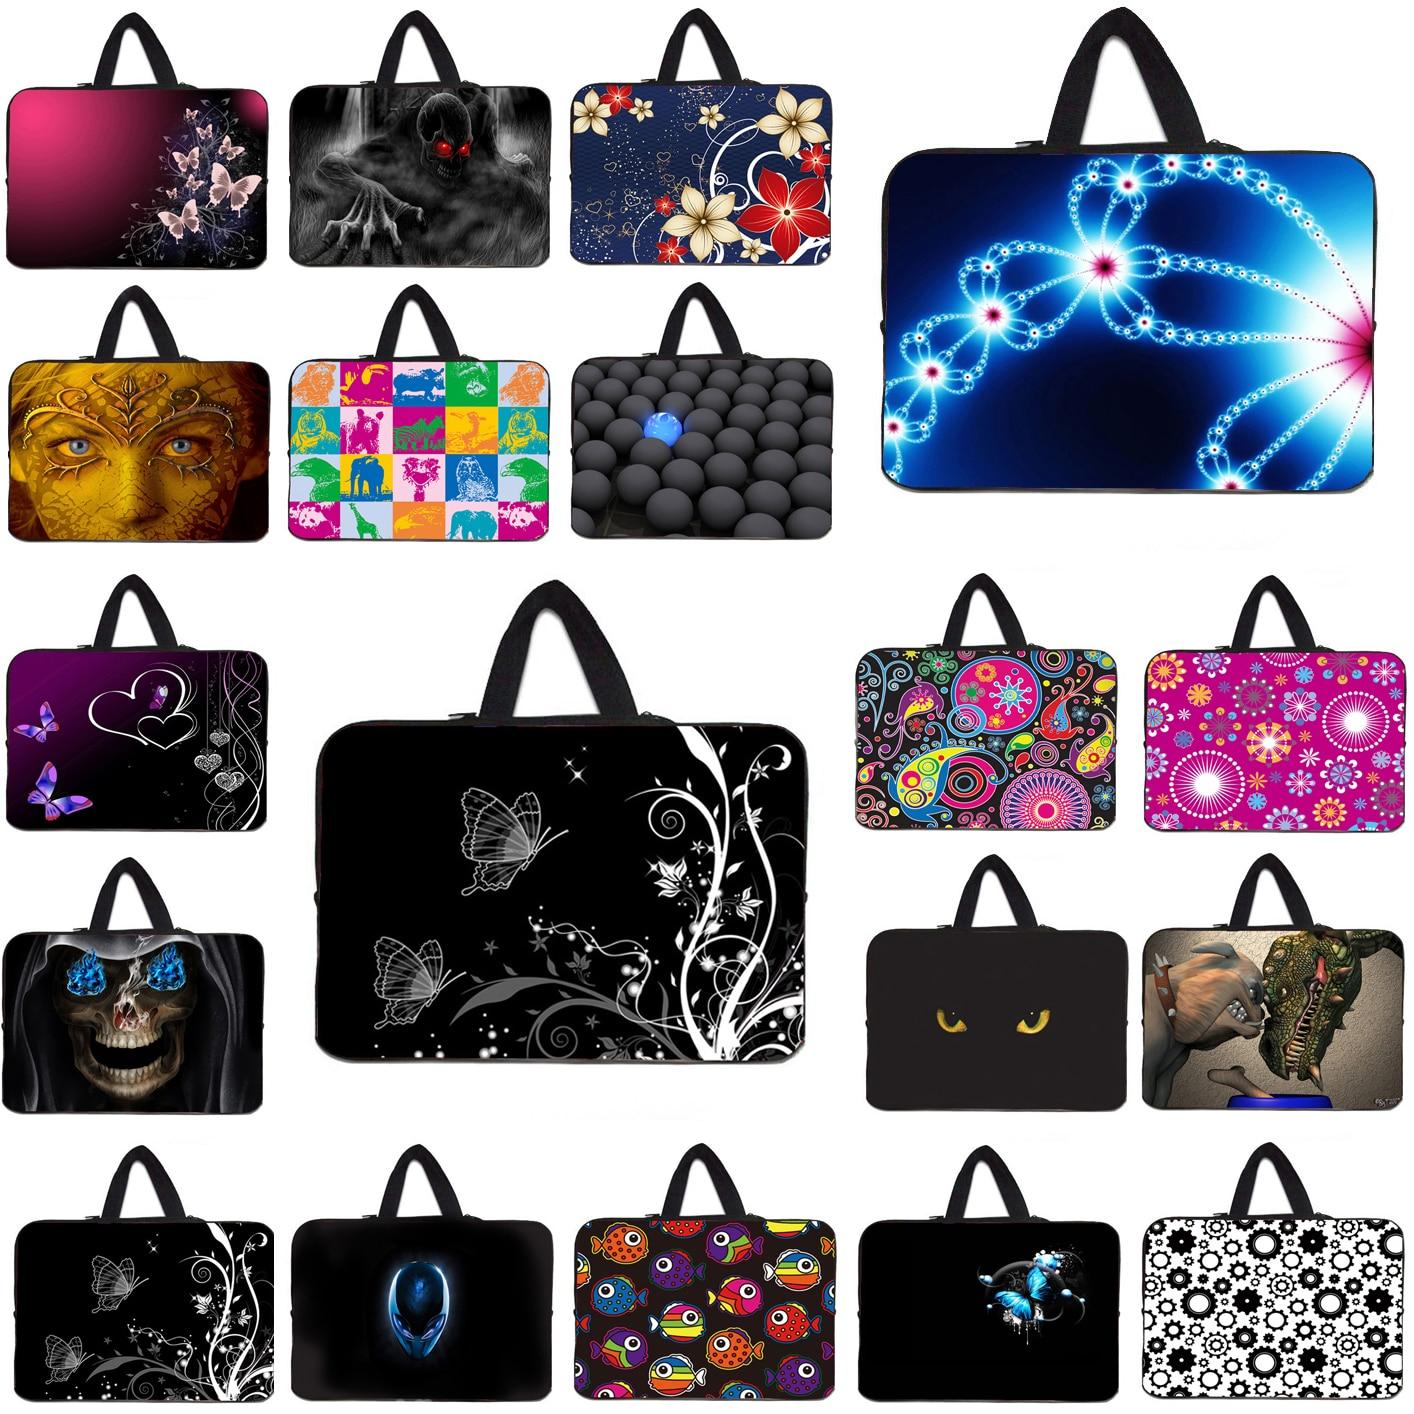 10 Mini PC Laptop Bag 15.6 15 14 13 13.3 12 17 Notbook Handle Inner Cover Pouch Women Chromebook Bag For Macbook Chuwi Lenovo HP